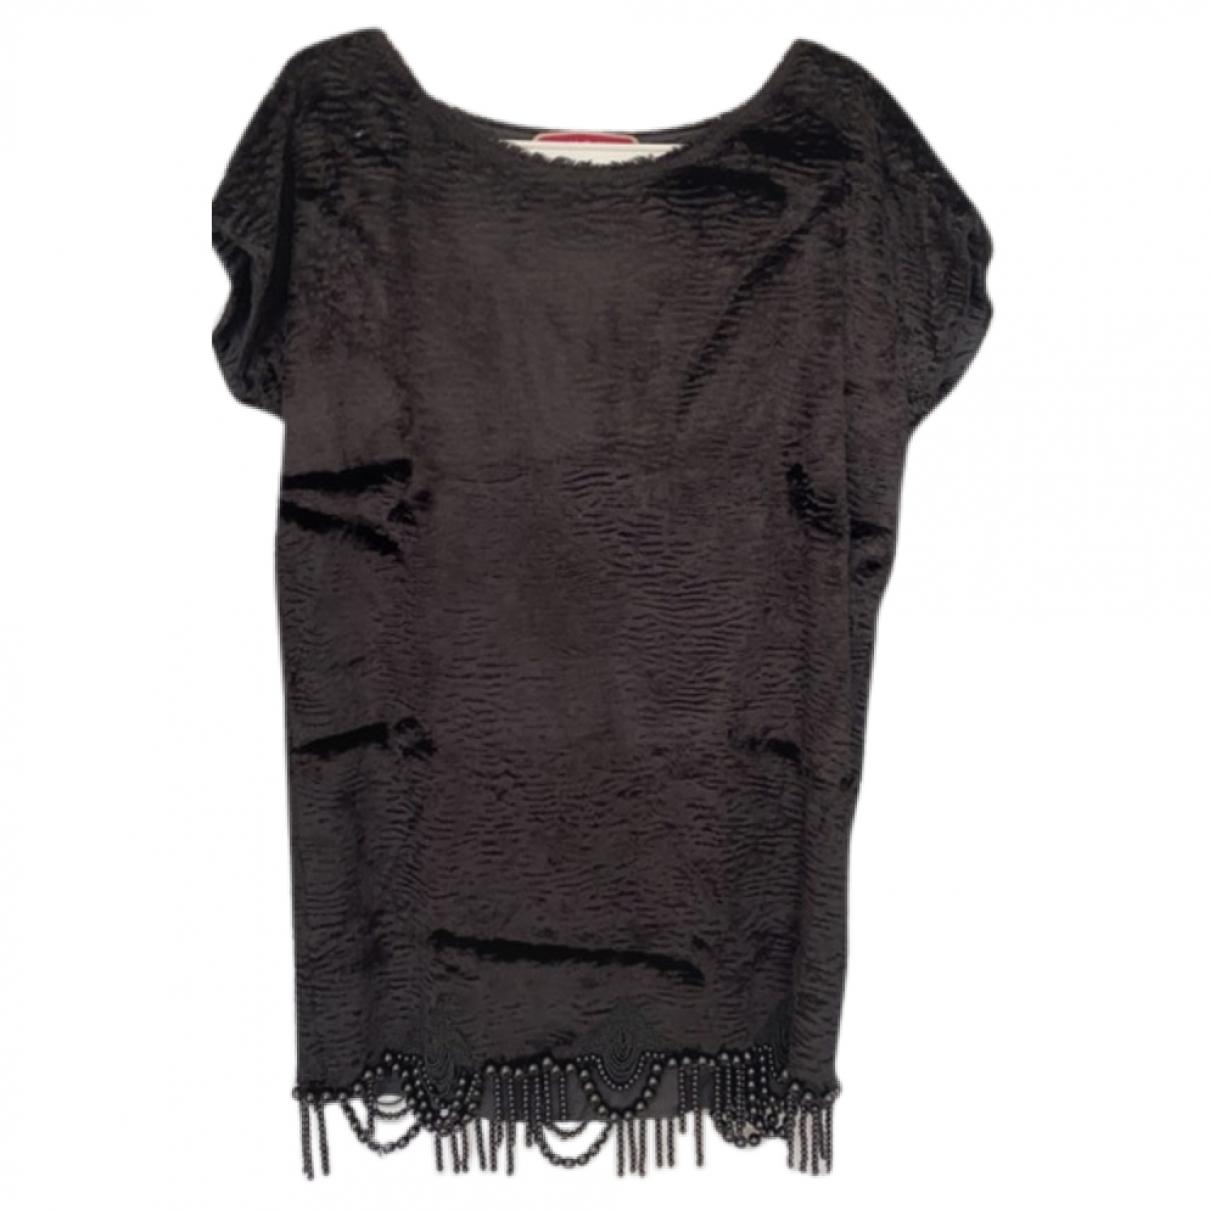 Manoush \N Black Cotton dress for Women 40 FR